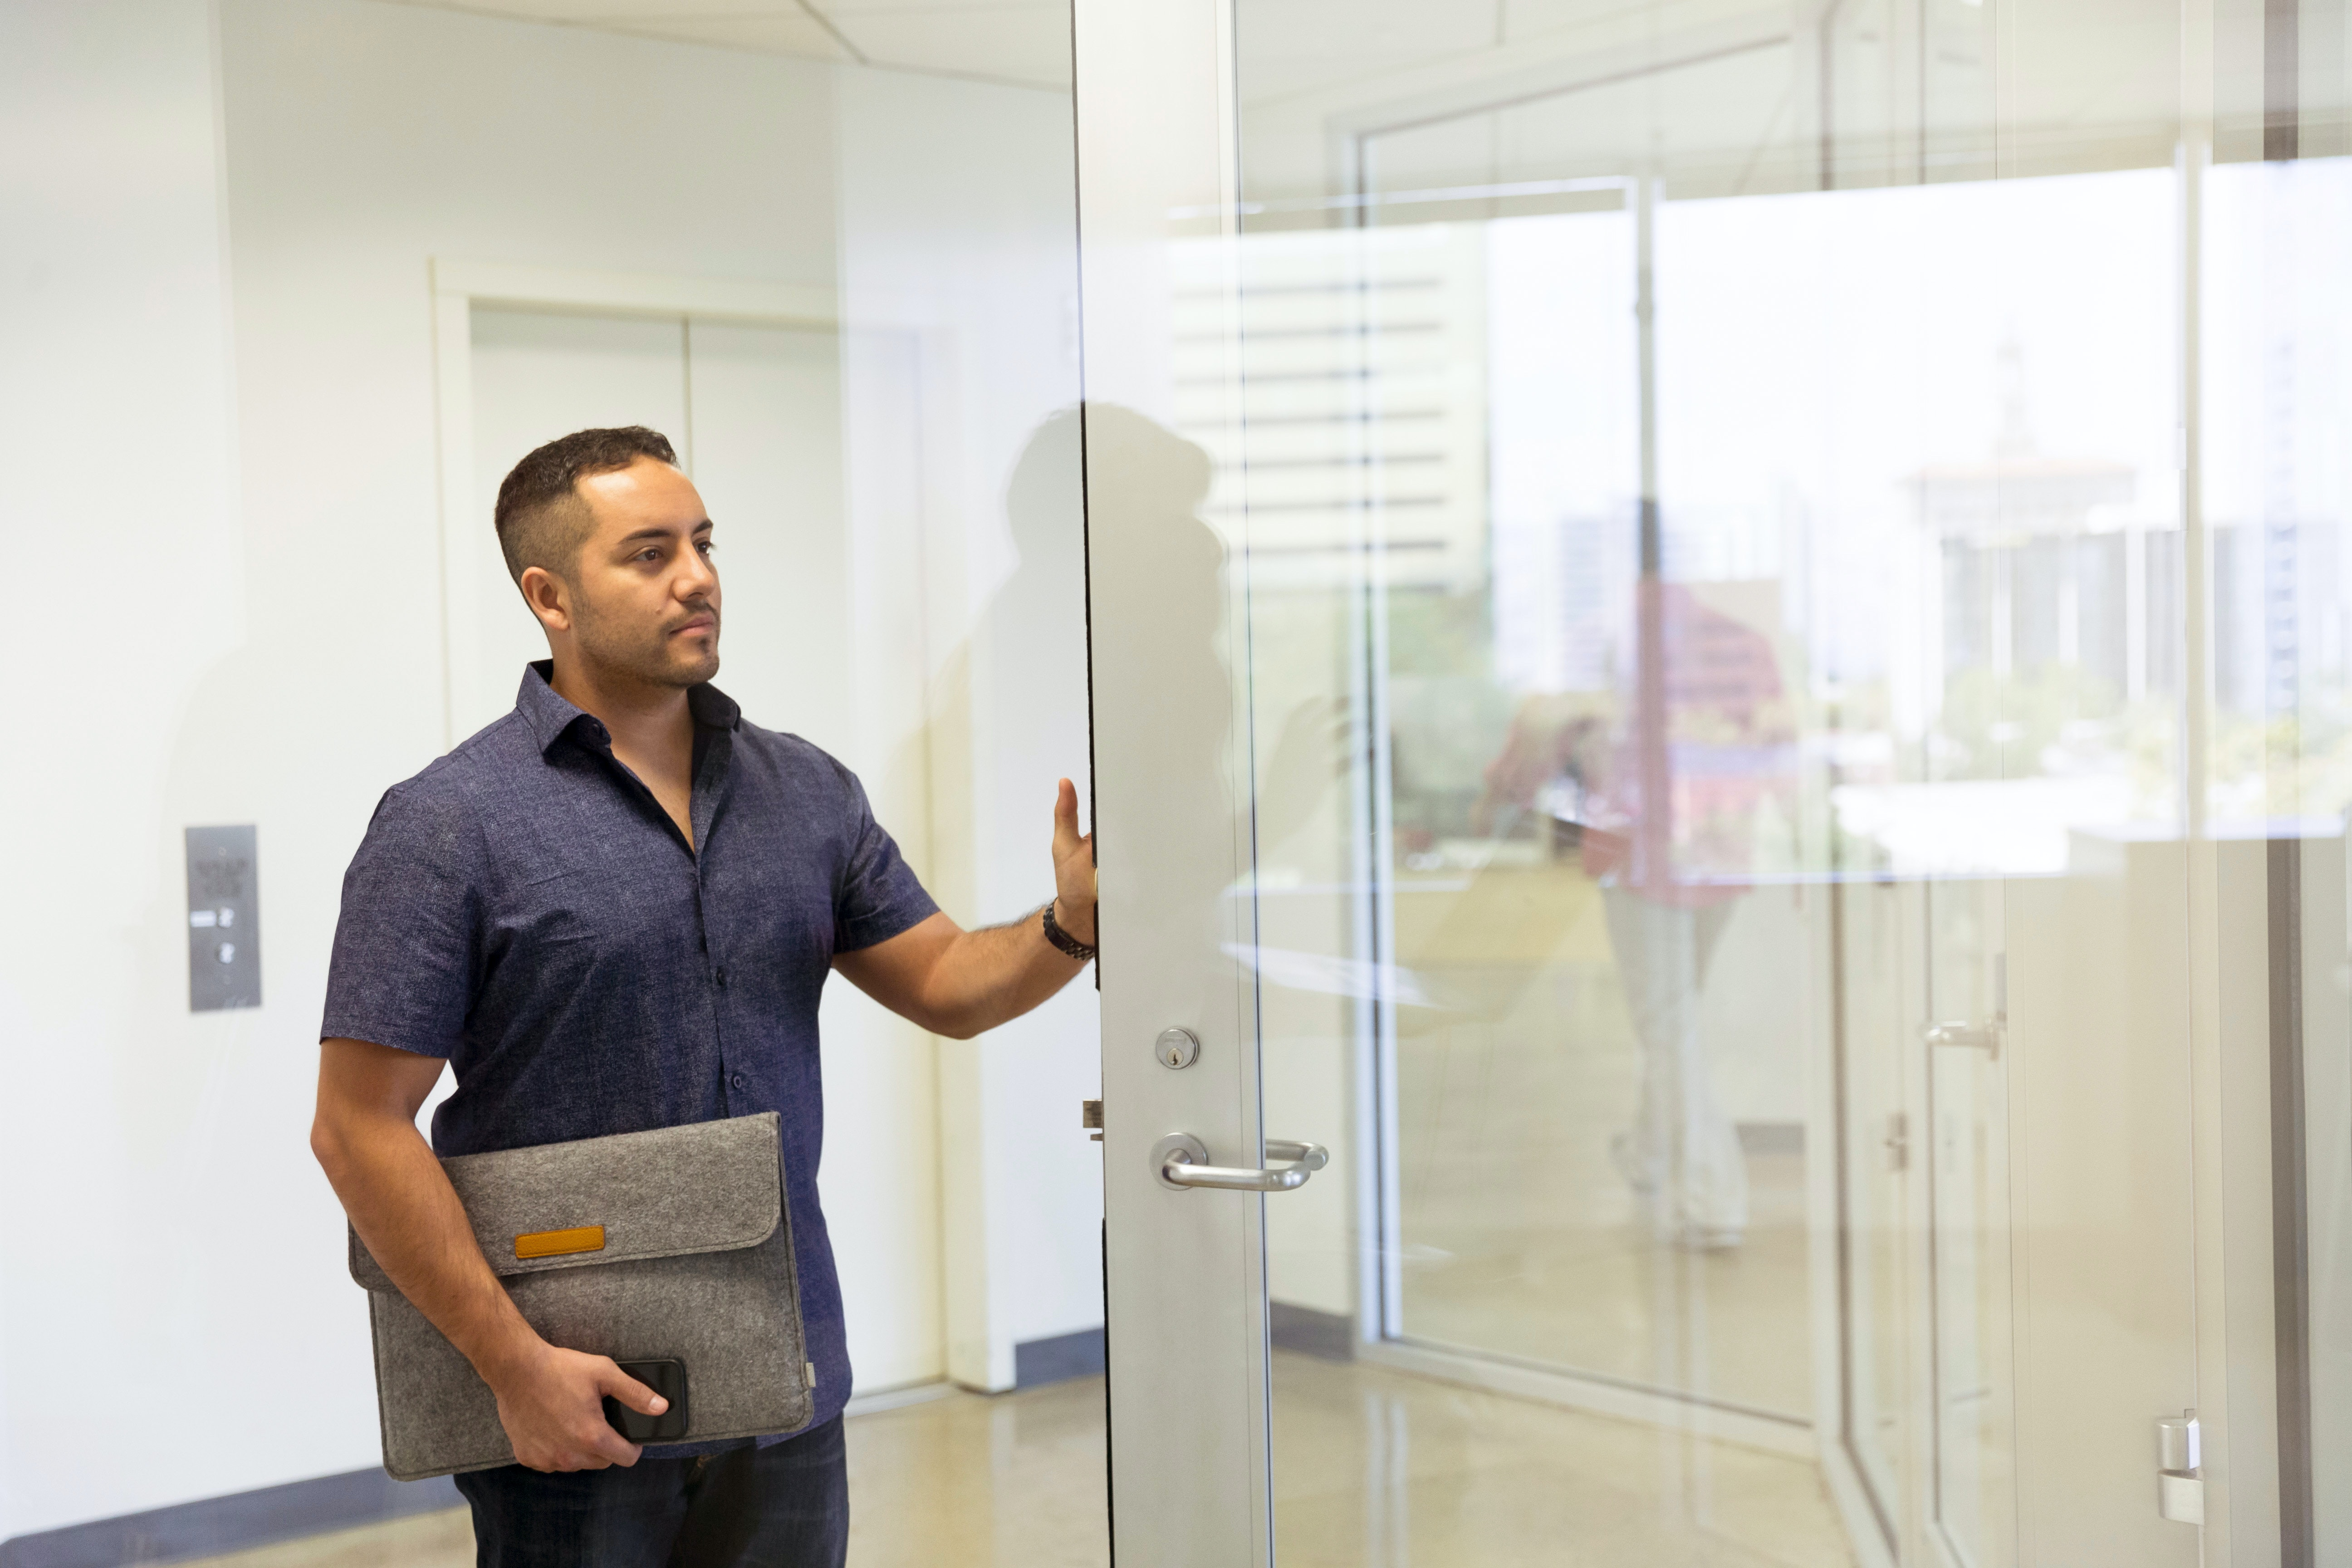 sklenené dvere, muž